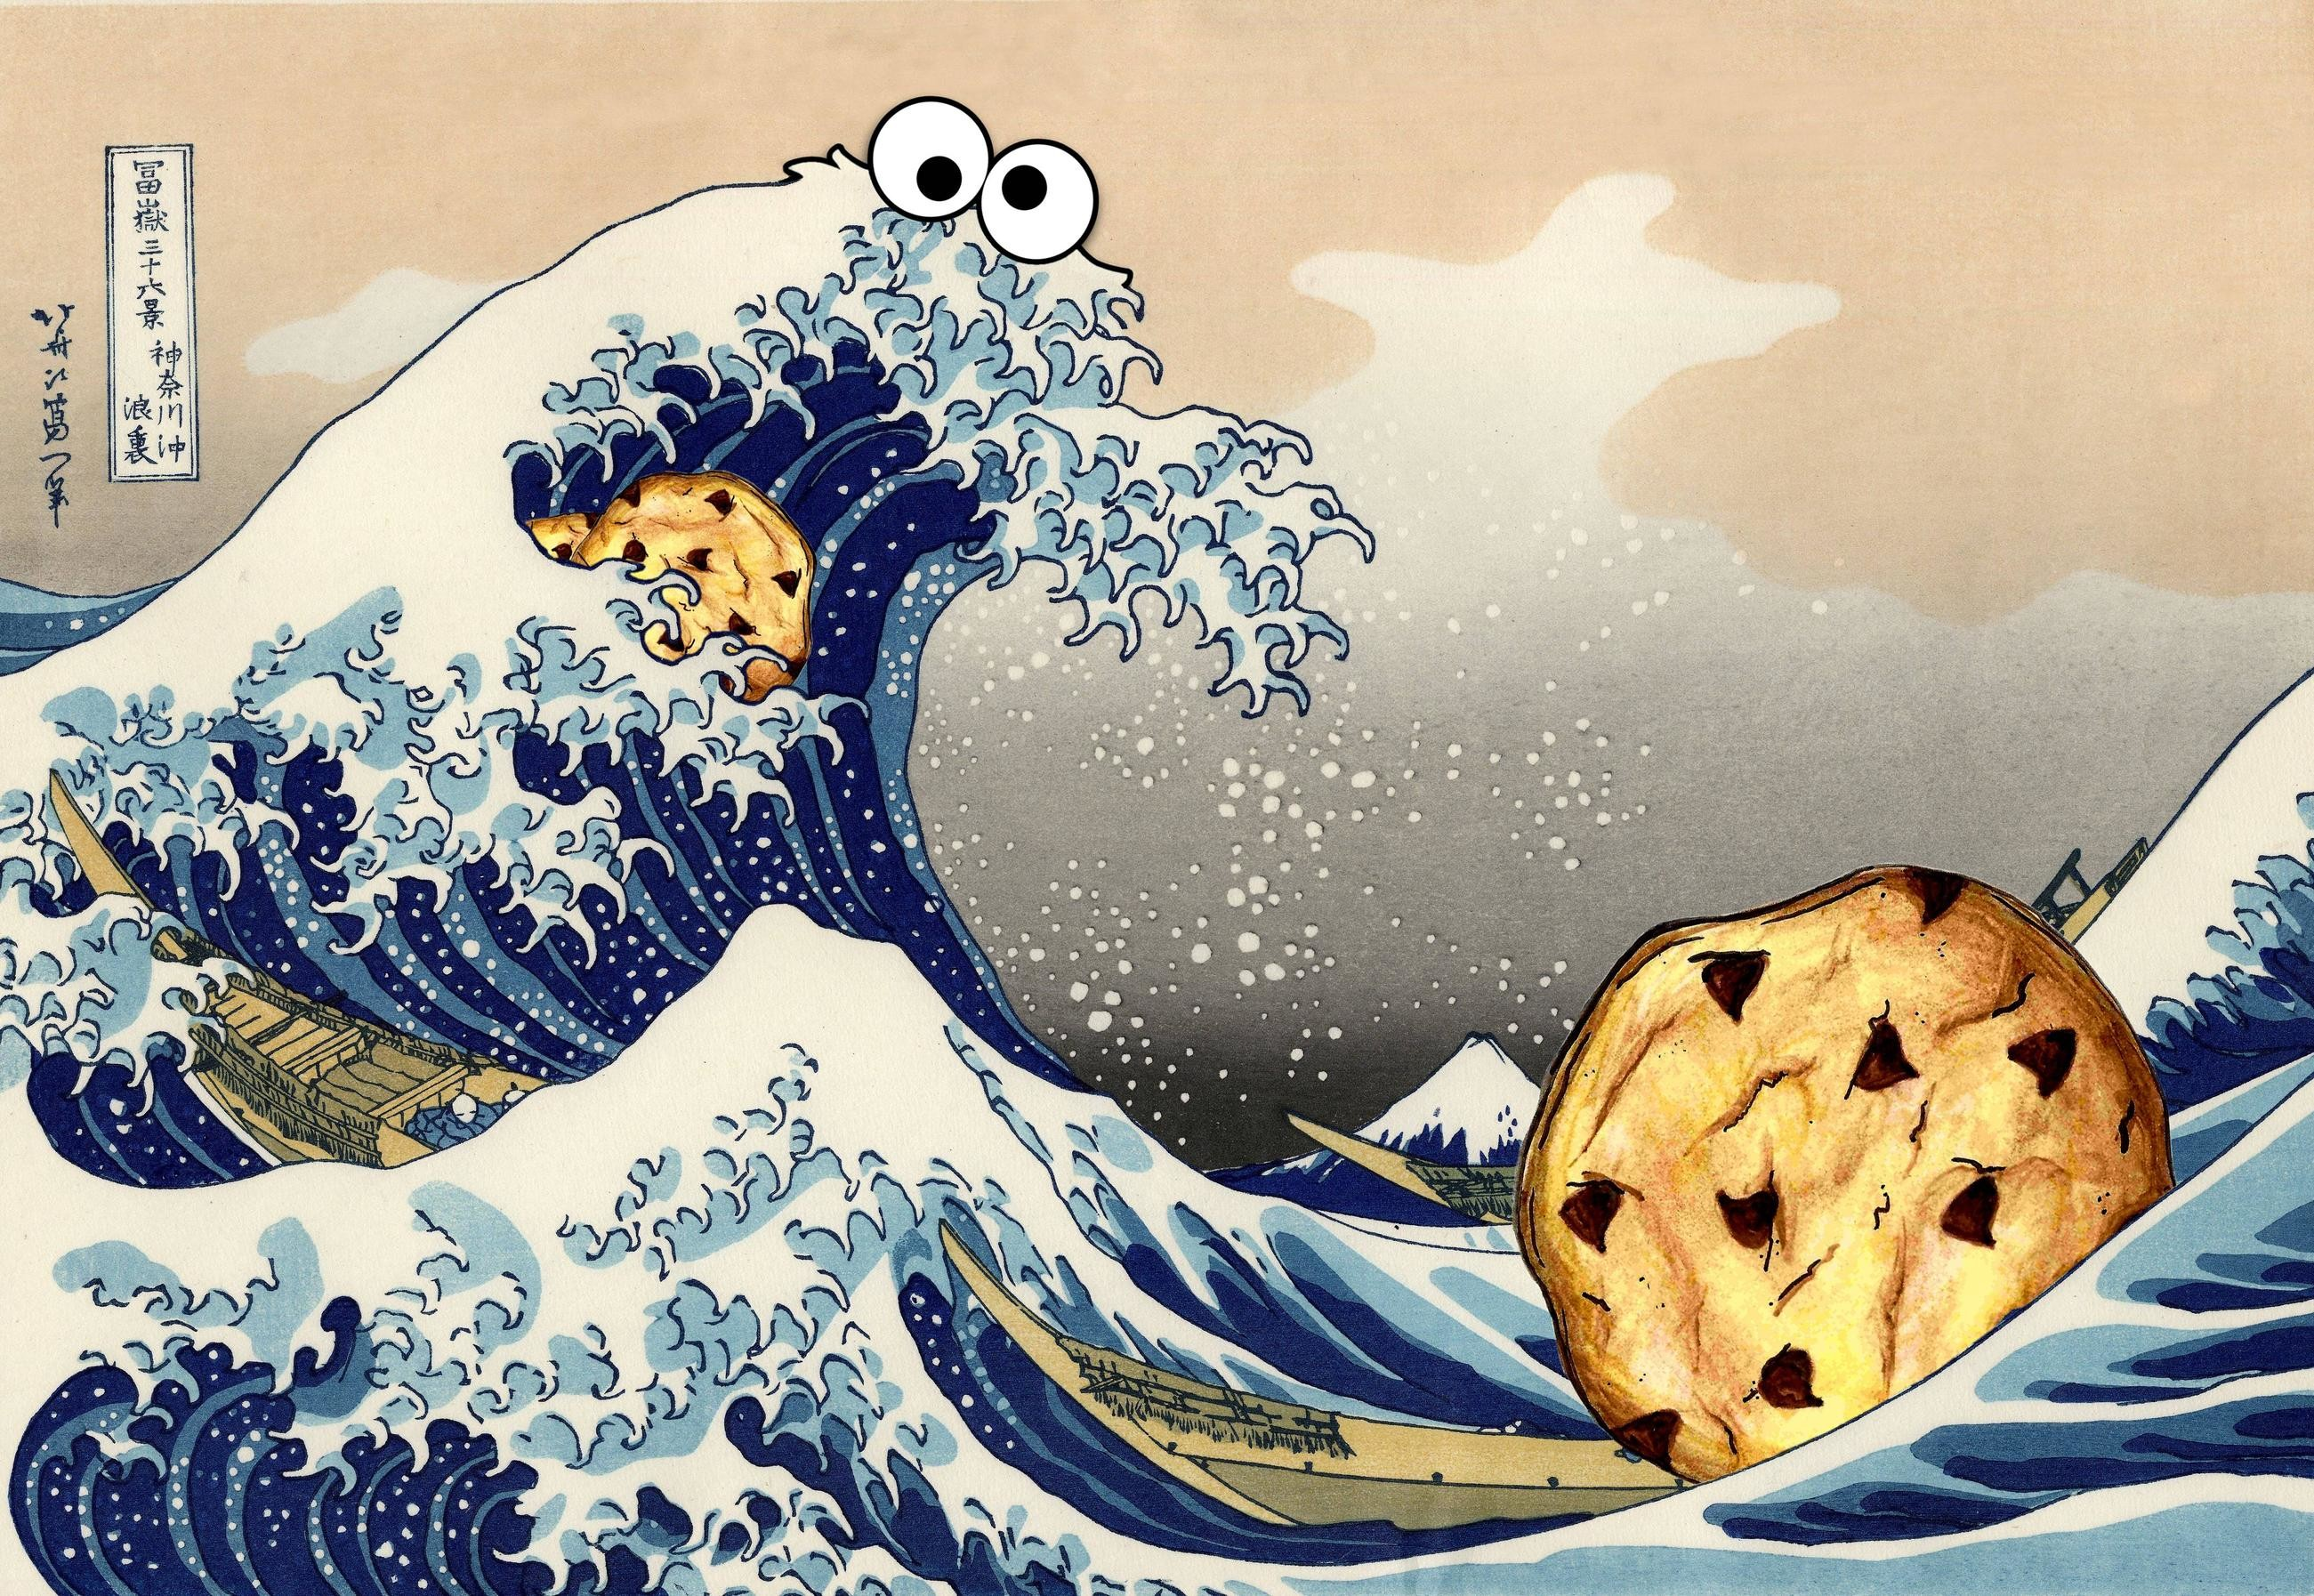 Pacman Wallpaper Iphone X Cookie Monster Wallpaper Hd 70 Images